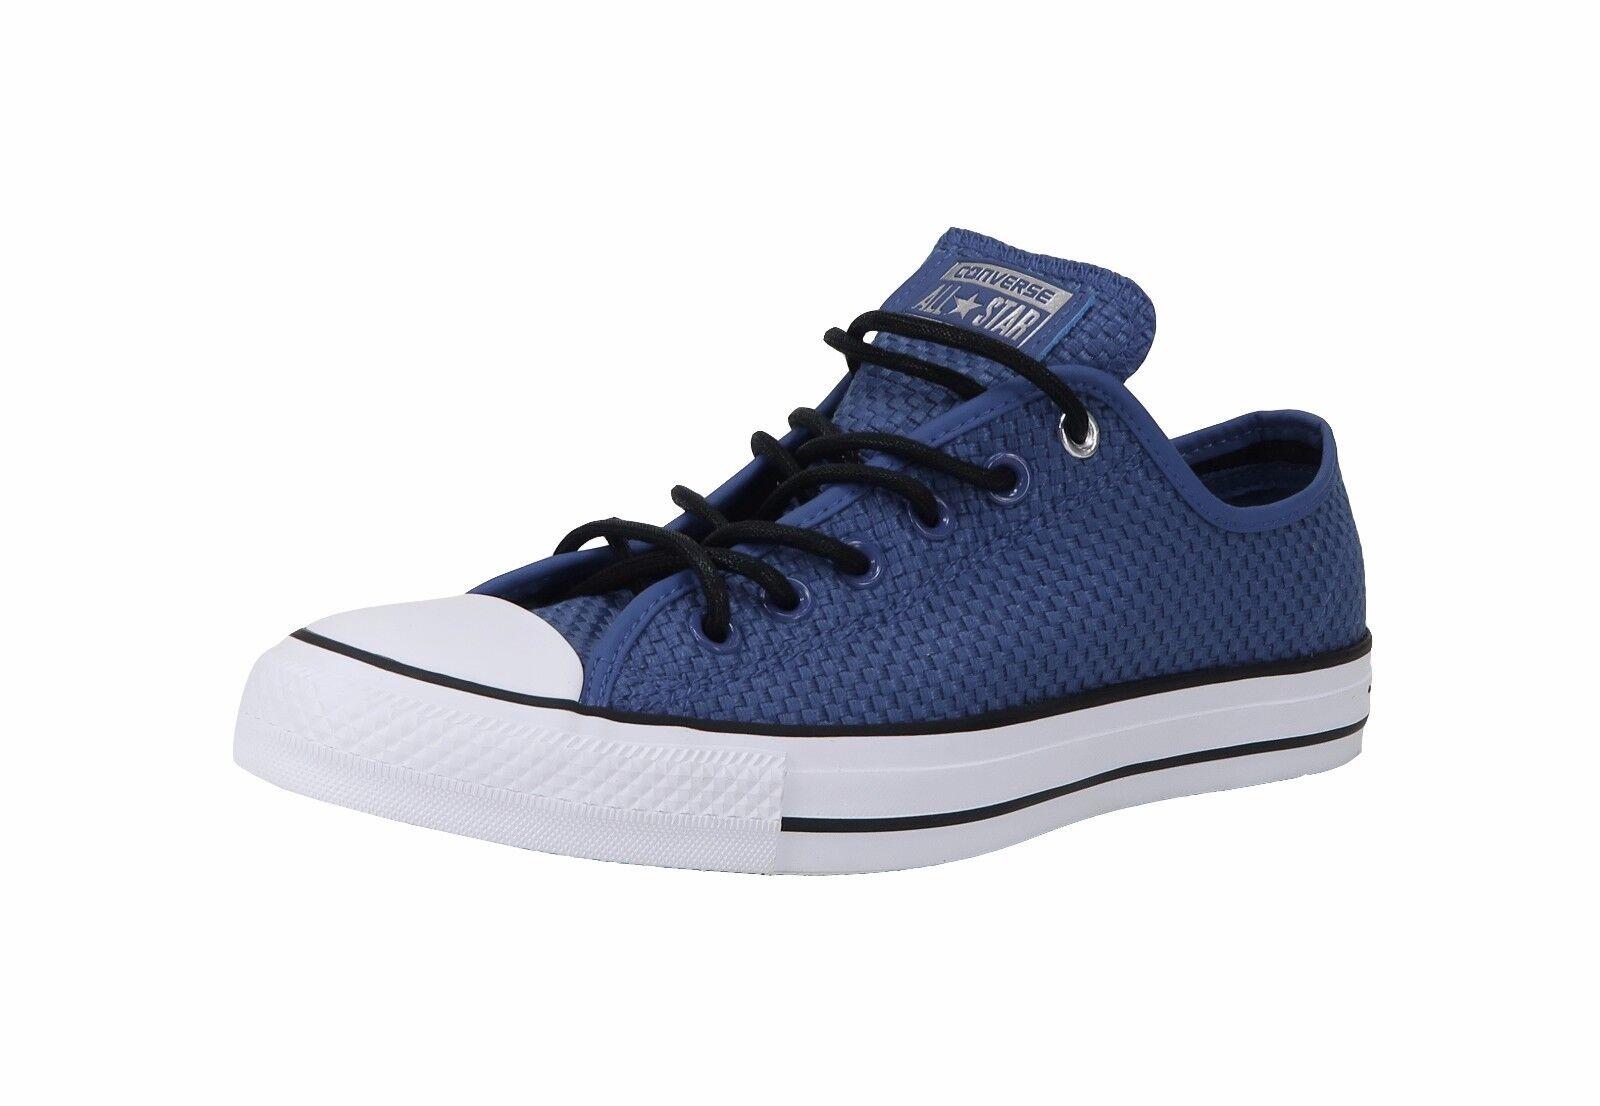 Converse shoes Men Women Unisex All Star Chuck Taylor Woven Road Trip bluee White